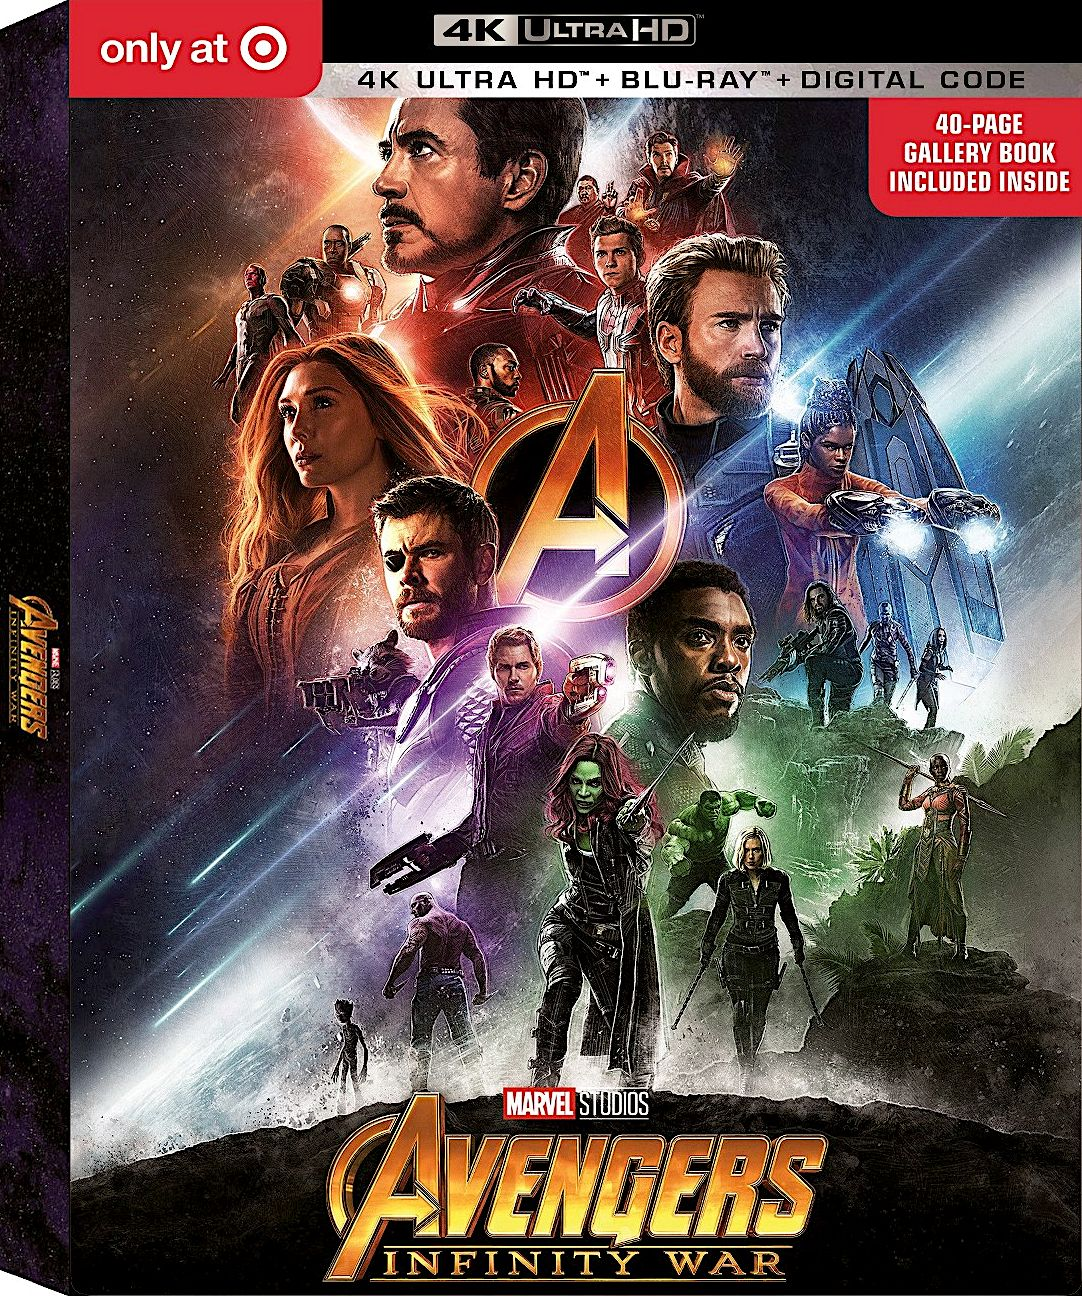 Avengers Infinity War 4k Blu Ray Target Exclusive Gallery Book Disney Avengers Movies Marvel Studios Marvel Avengers